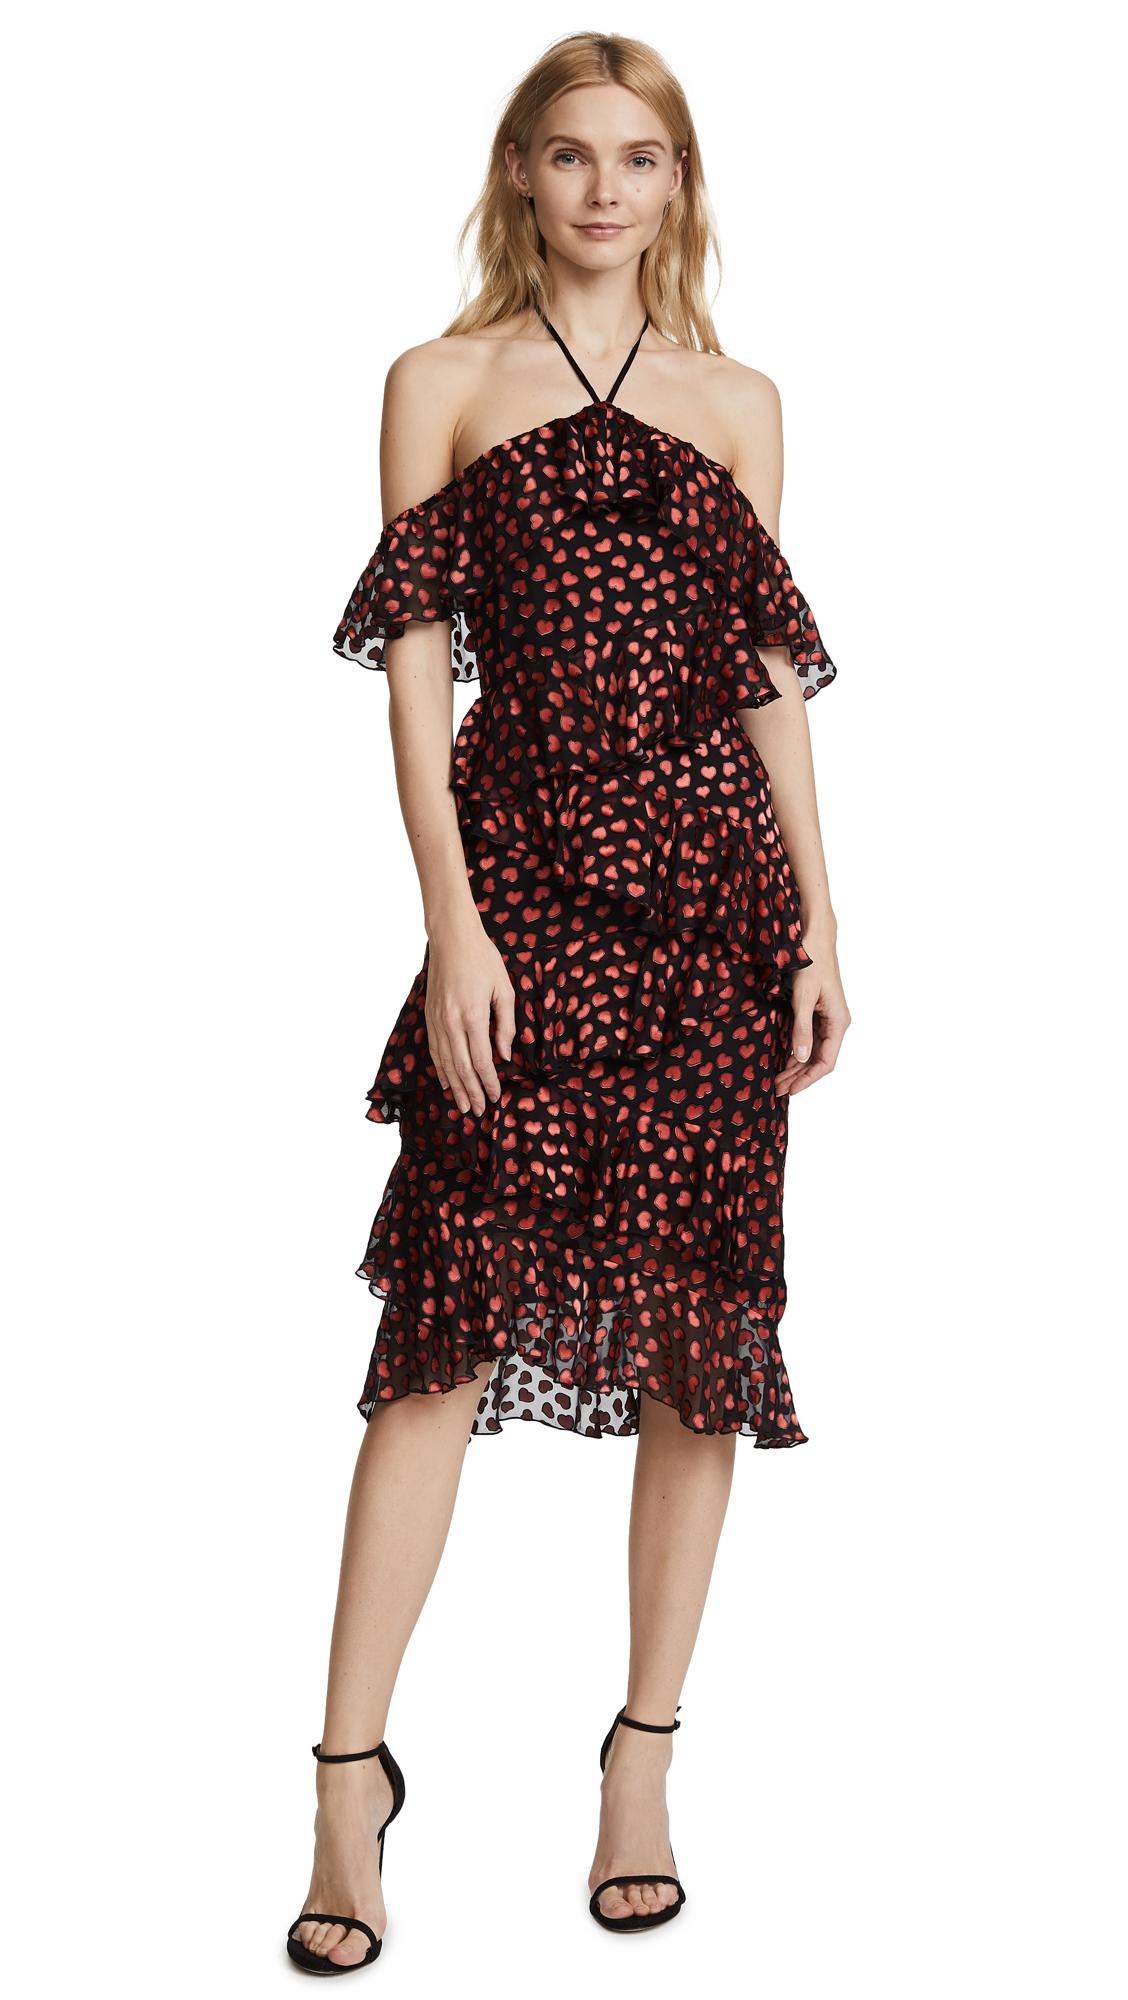 alice + olivia Annabeth Off Shoulder Dress